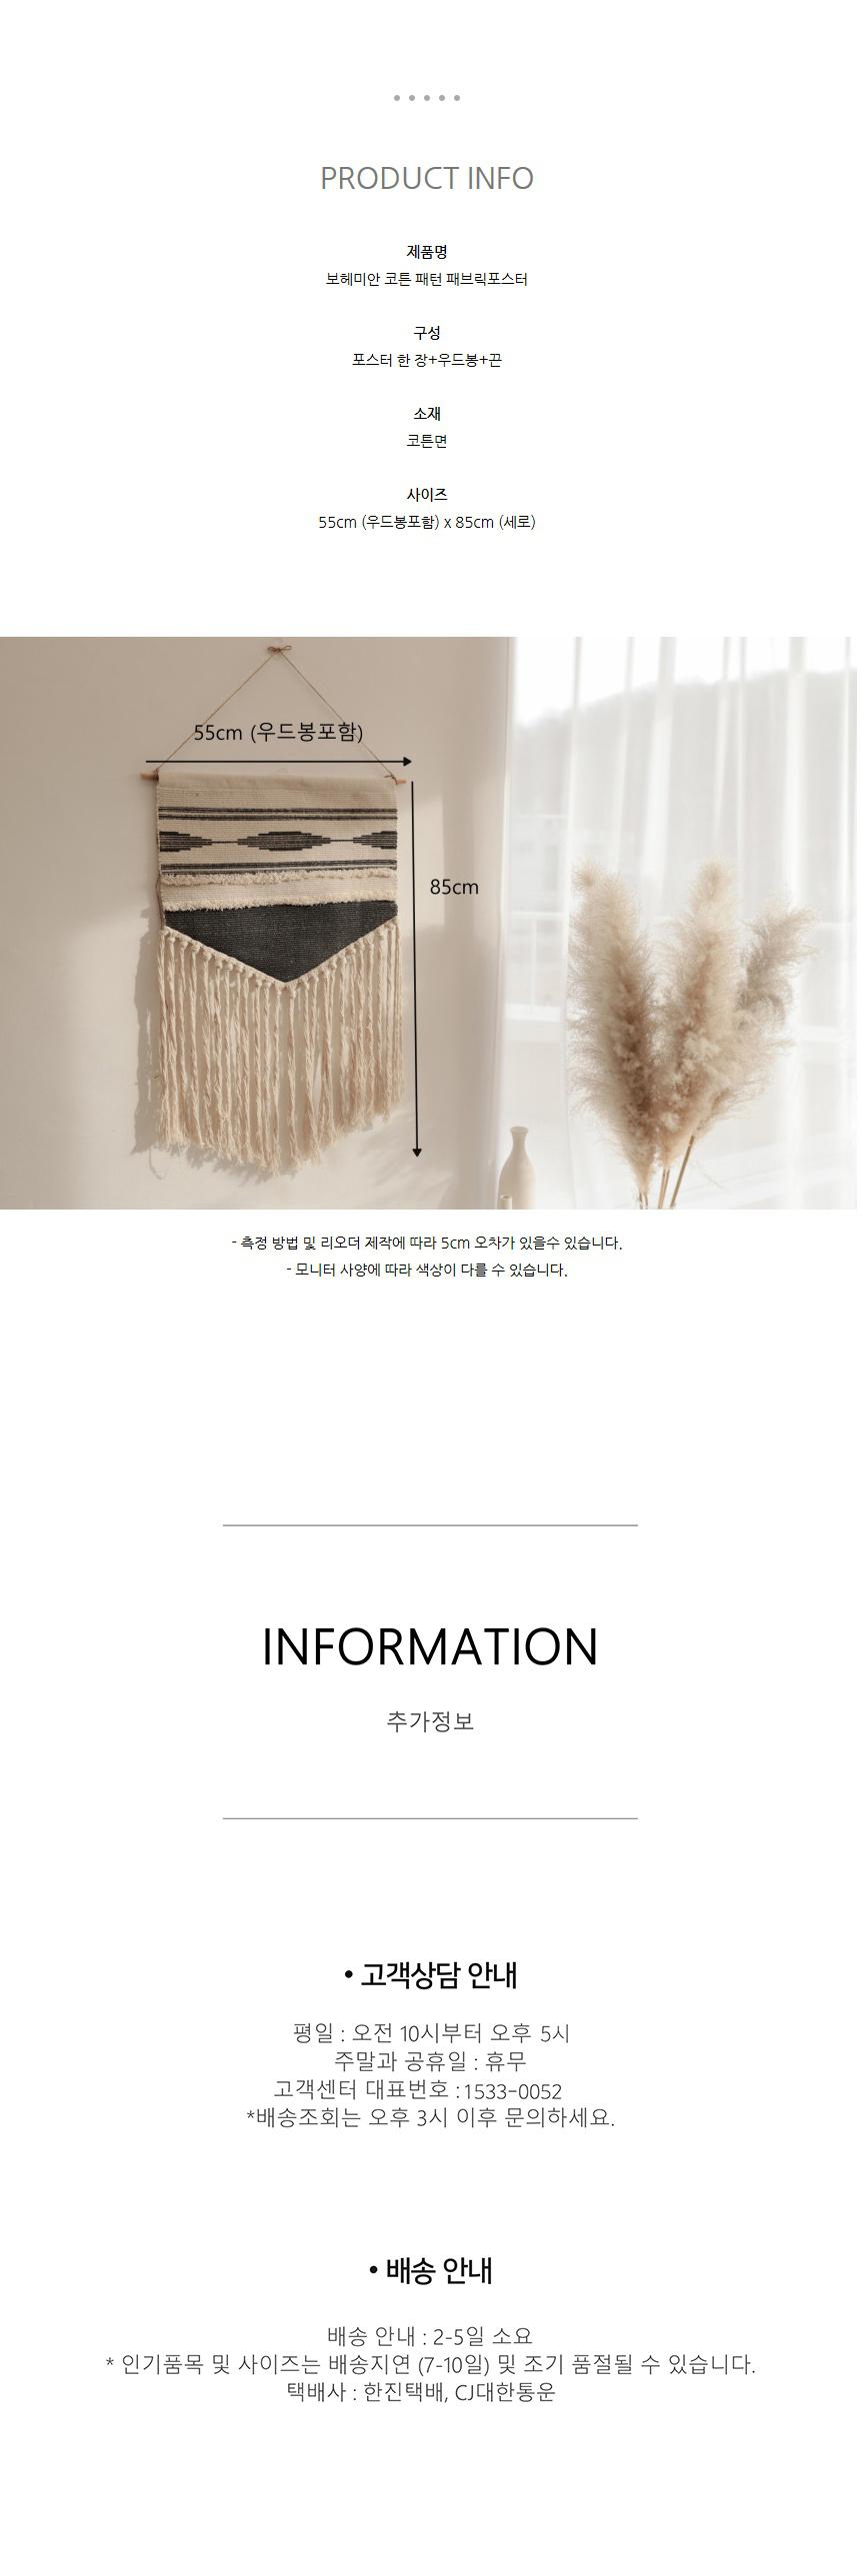 bohemian_cotton_fabricposter_05.jpg